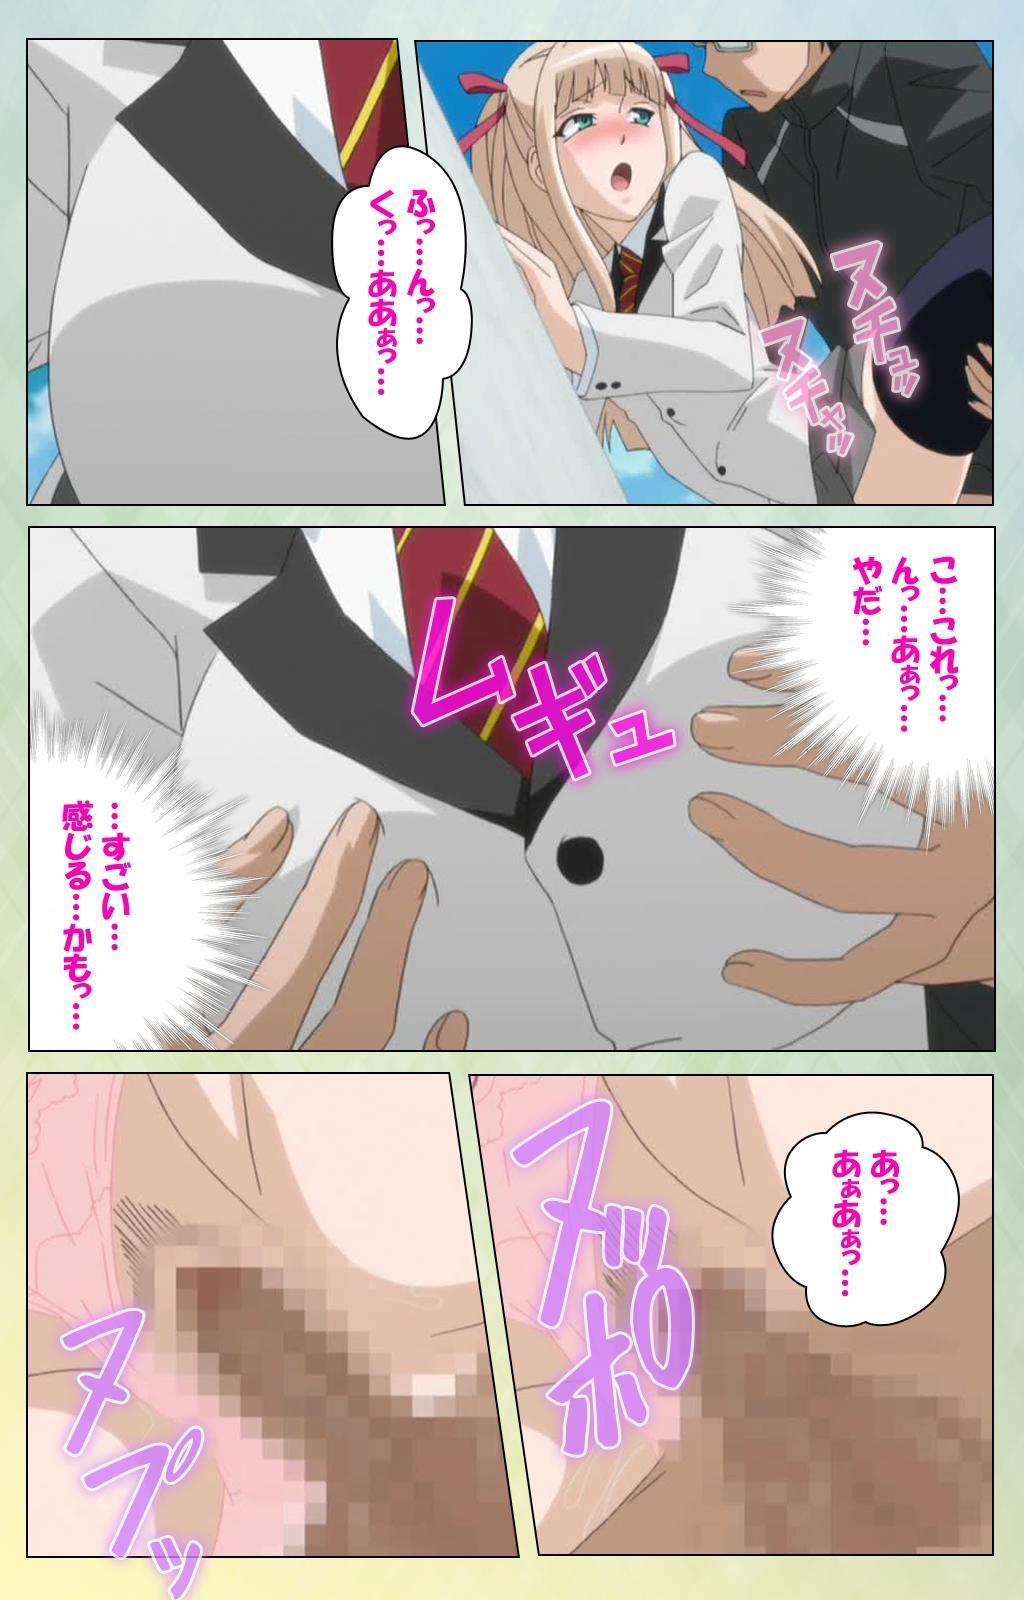 Furueru Kuchibiru fuzzy lips0 Complete Ban 39